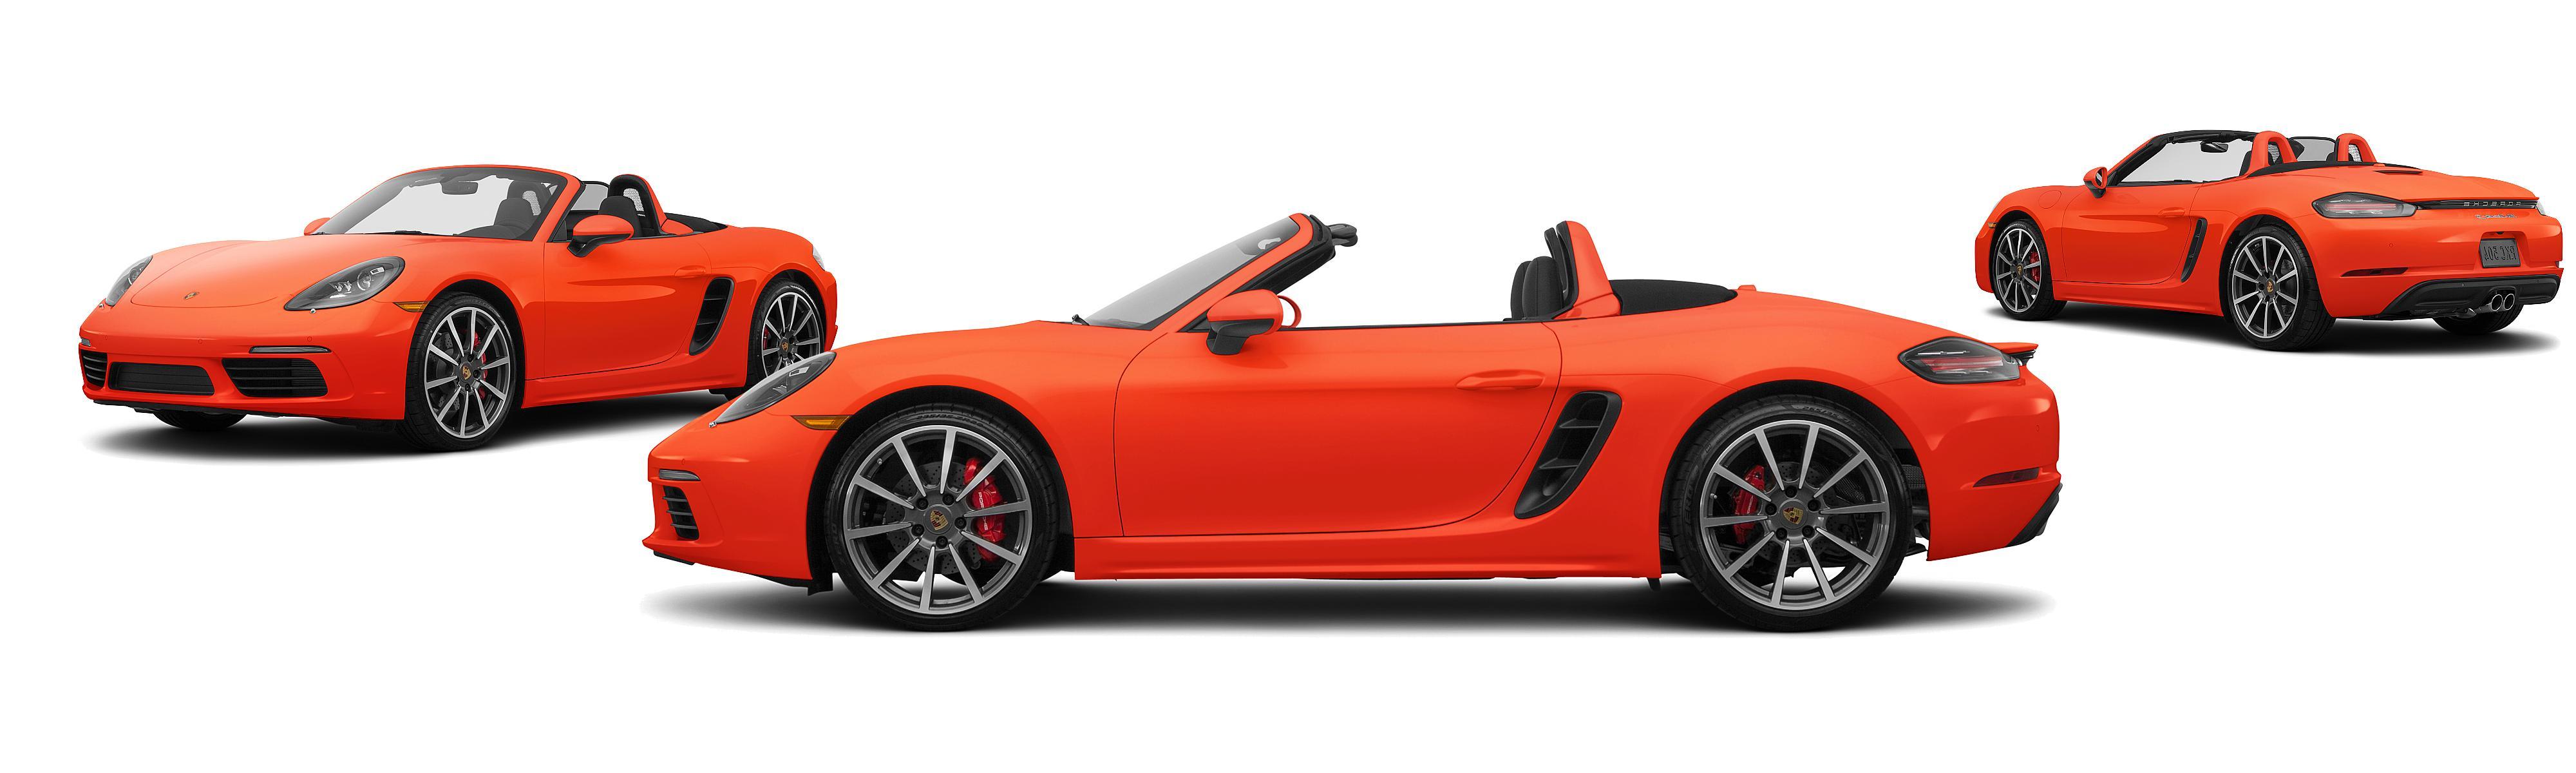 2018 Porsche 718 Boxster S 2dr Convertible Research GrooveCar